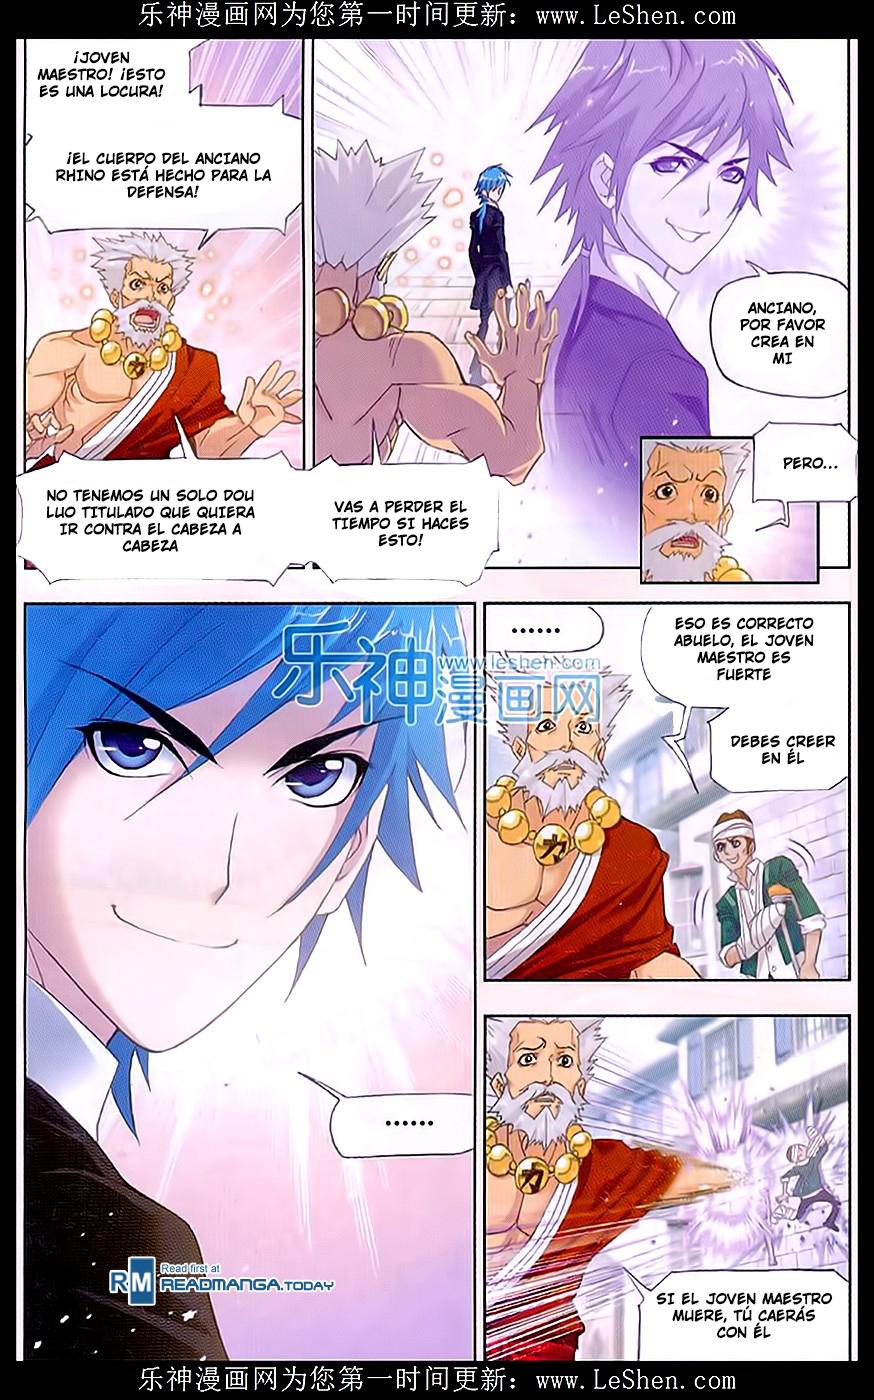 http://c5.ninemanga.com/es_manga/18/16210/450287/cdc10a8cf689568562f9f73cd4f483bd.jpg Page 5